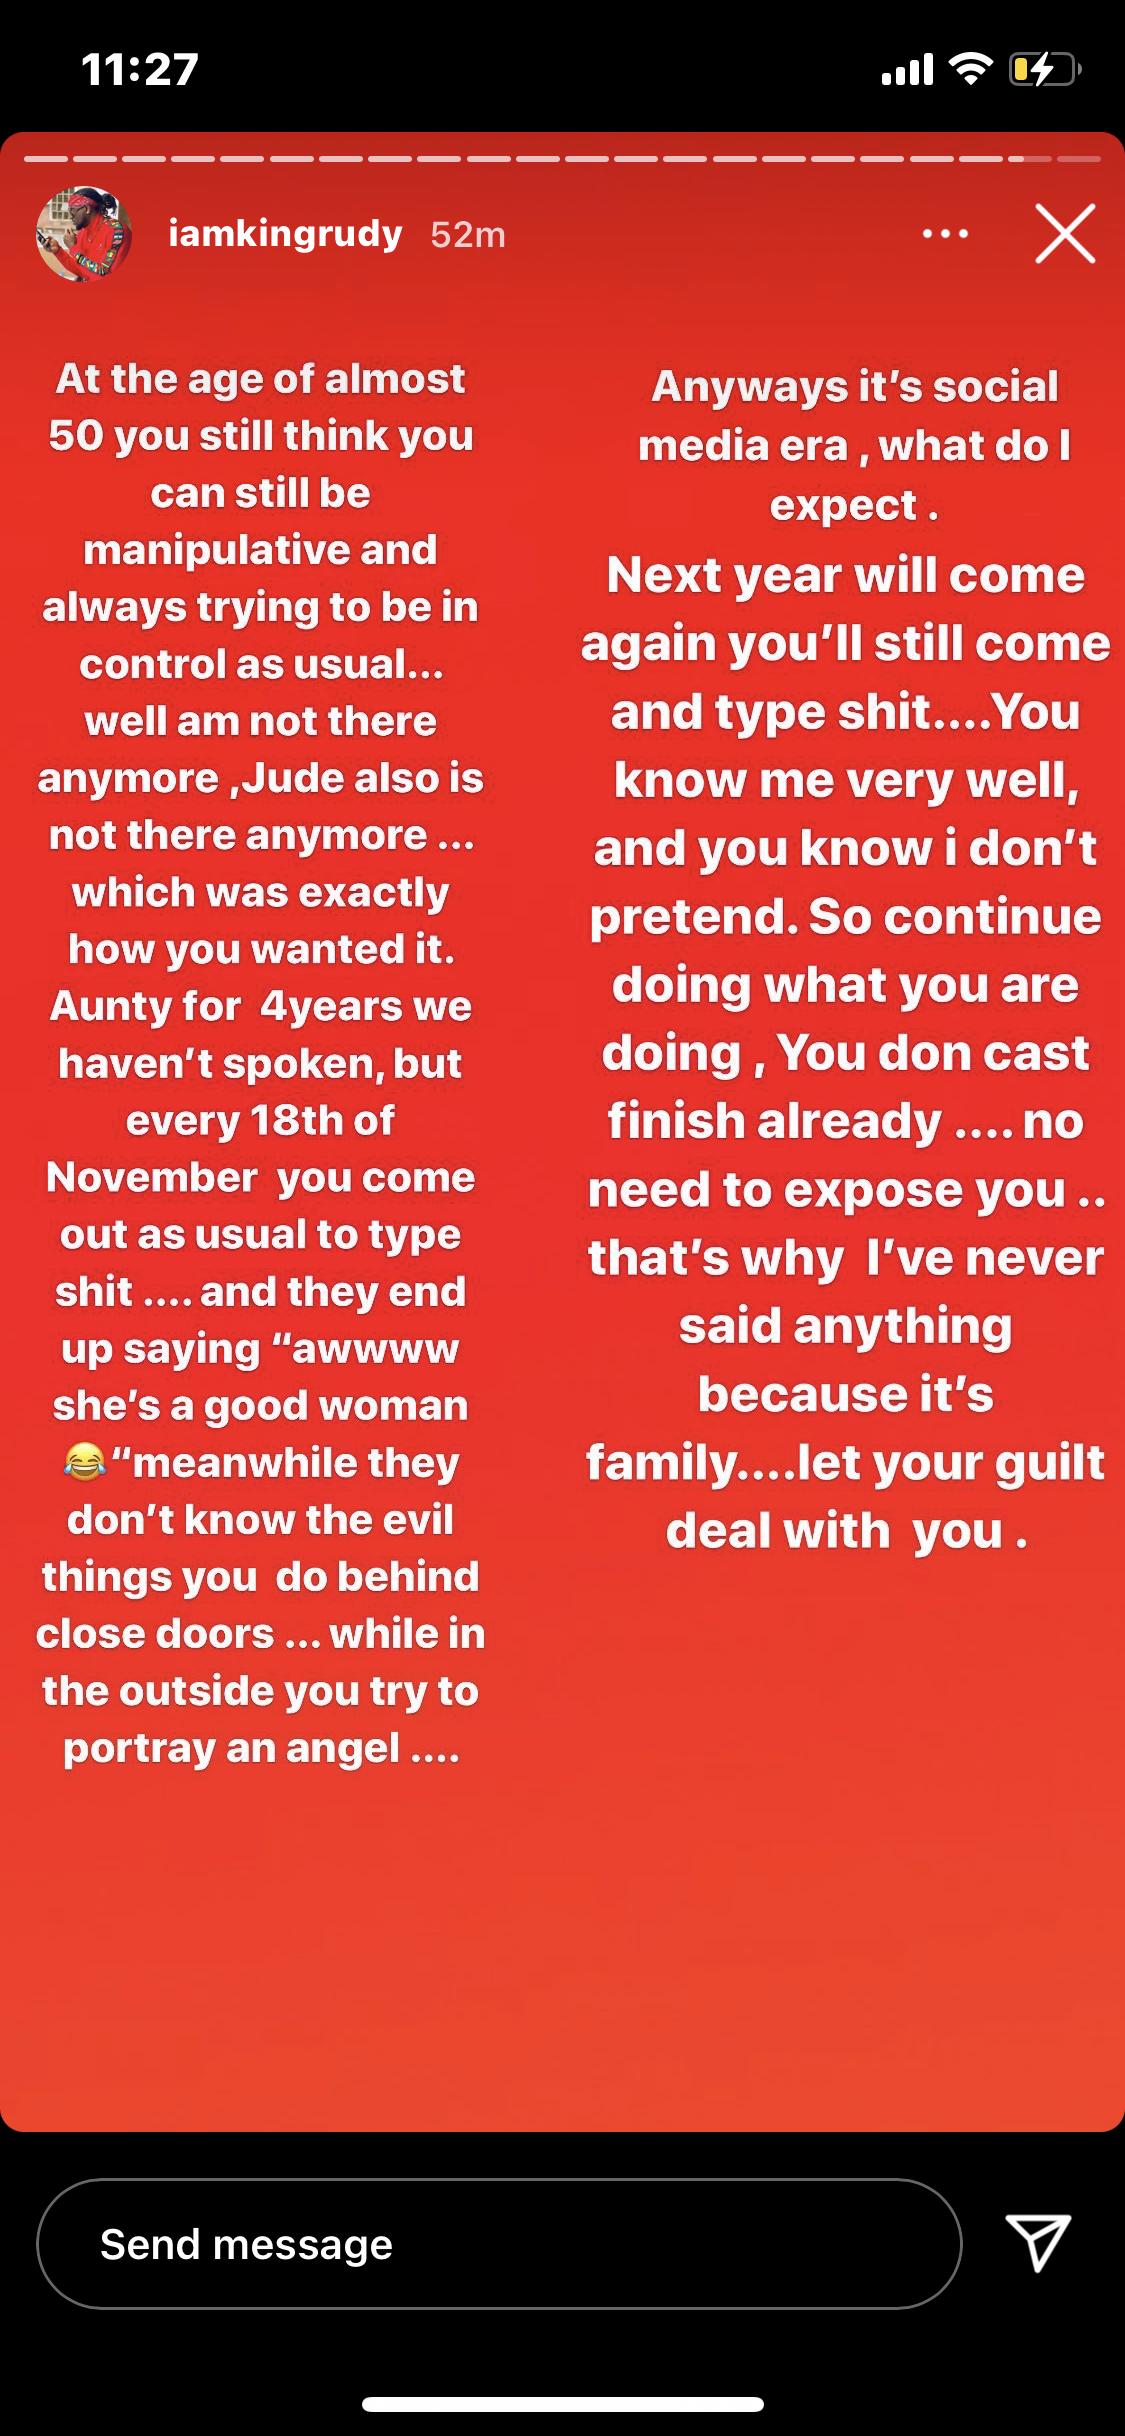 Paul's post